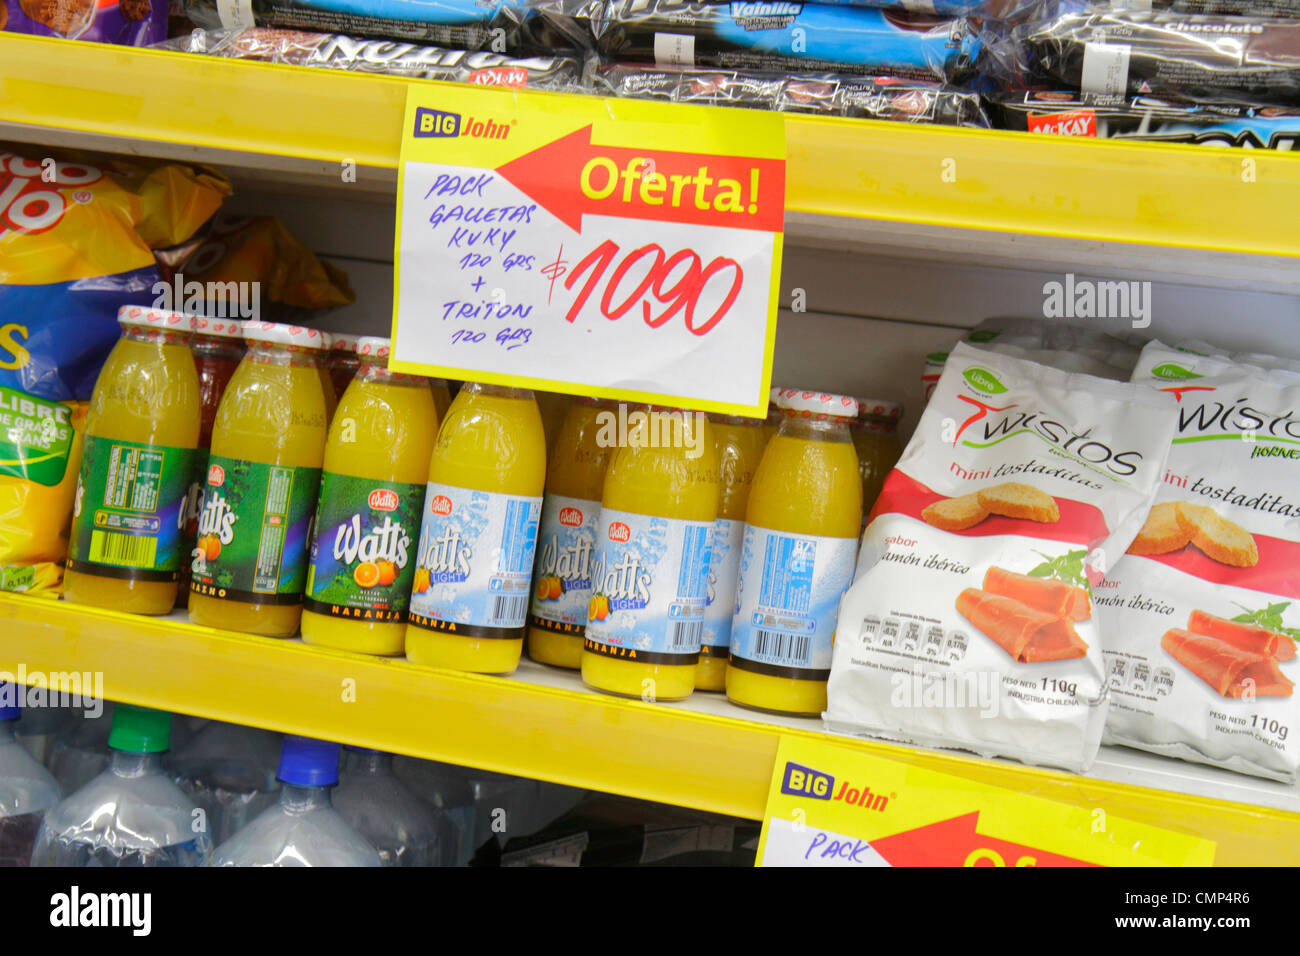 Retail Food Chain Stock Photos & Retail Food Chain Stock